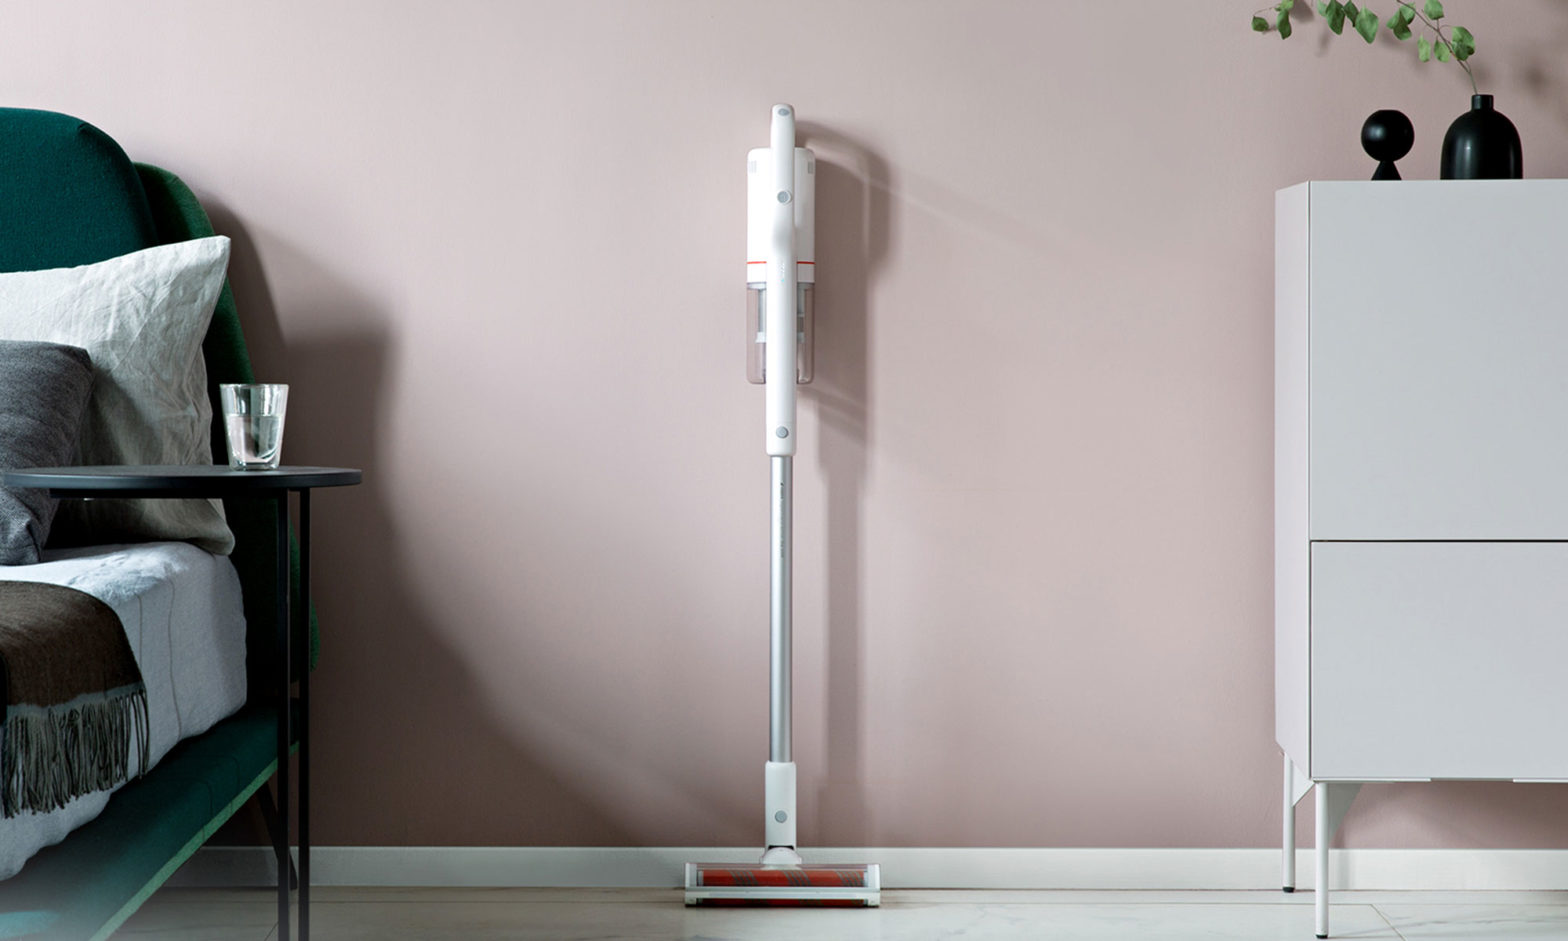 Roidmi Nex Storm Cordless Vacuum with Mop